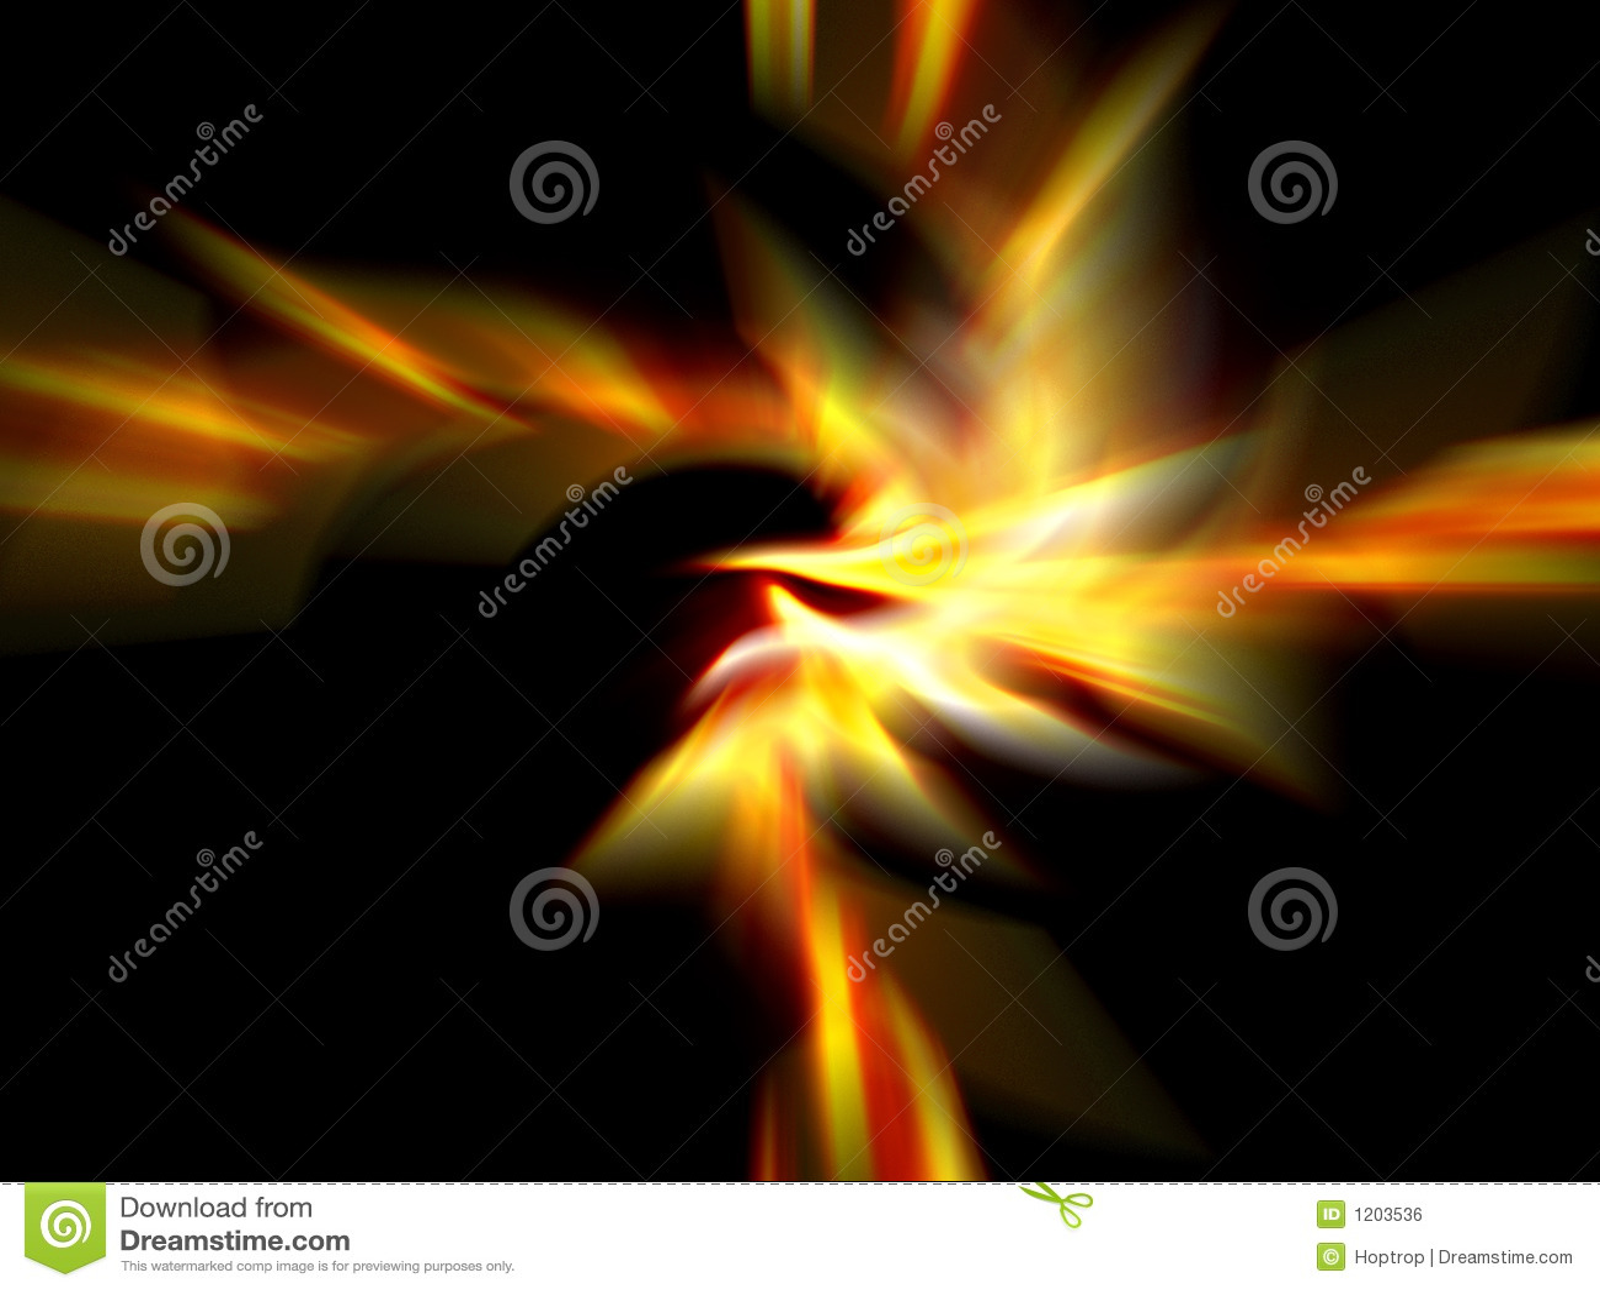 Fire blurs